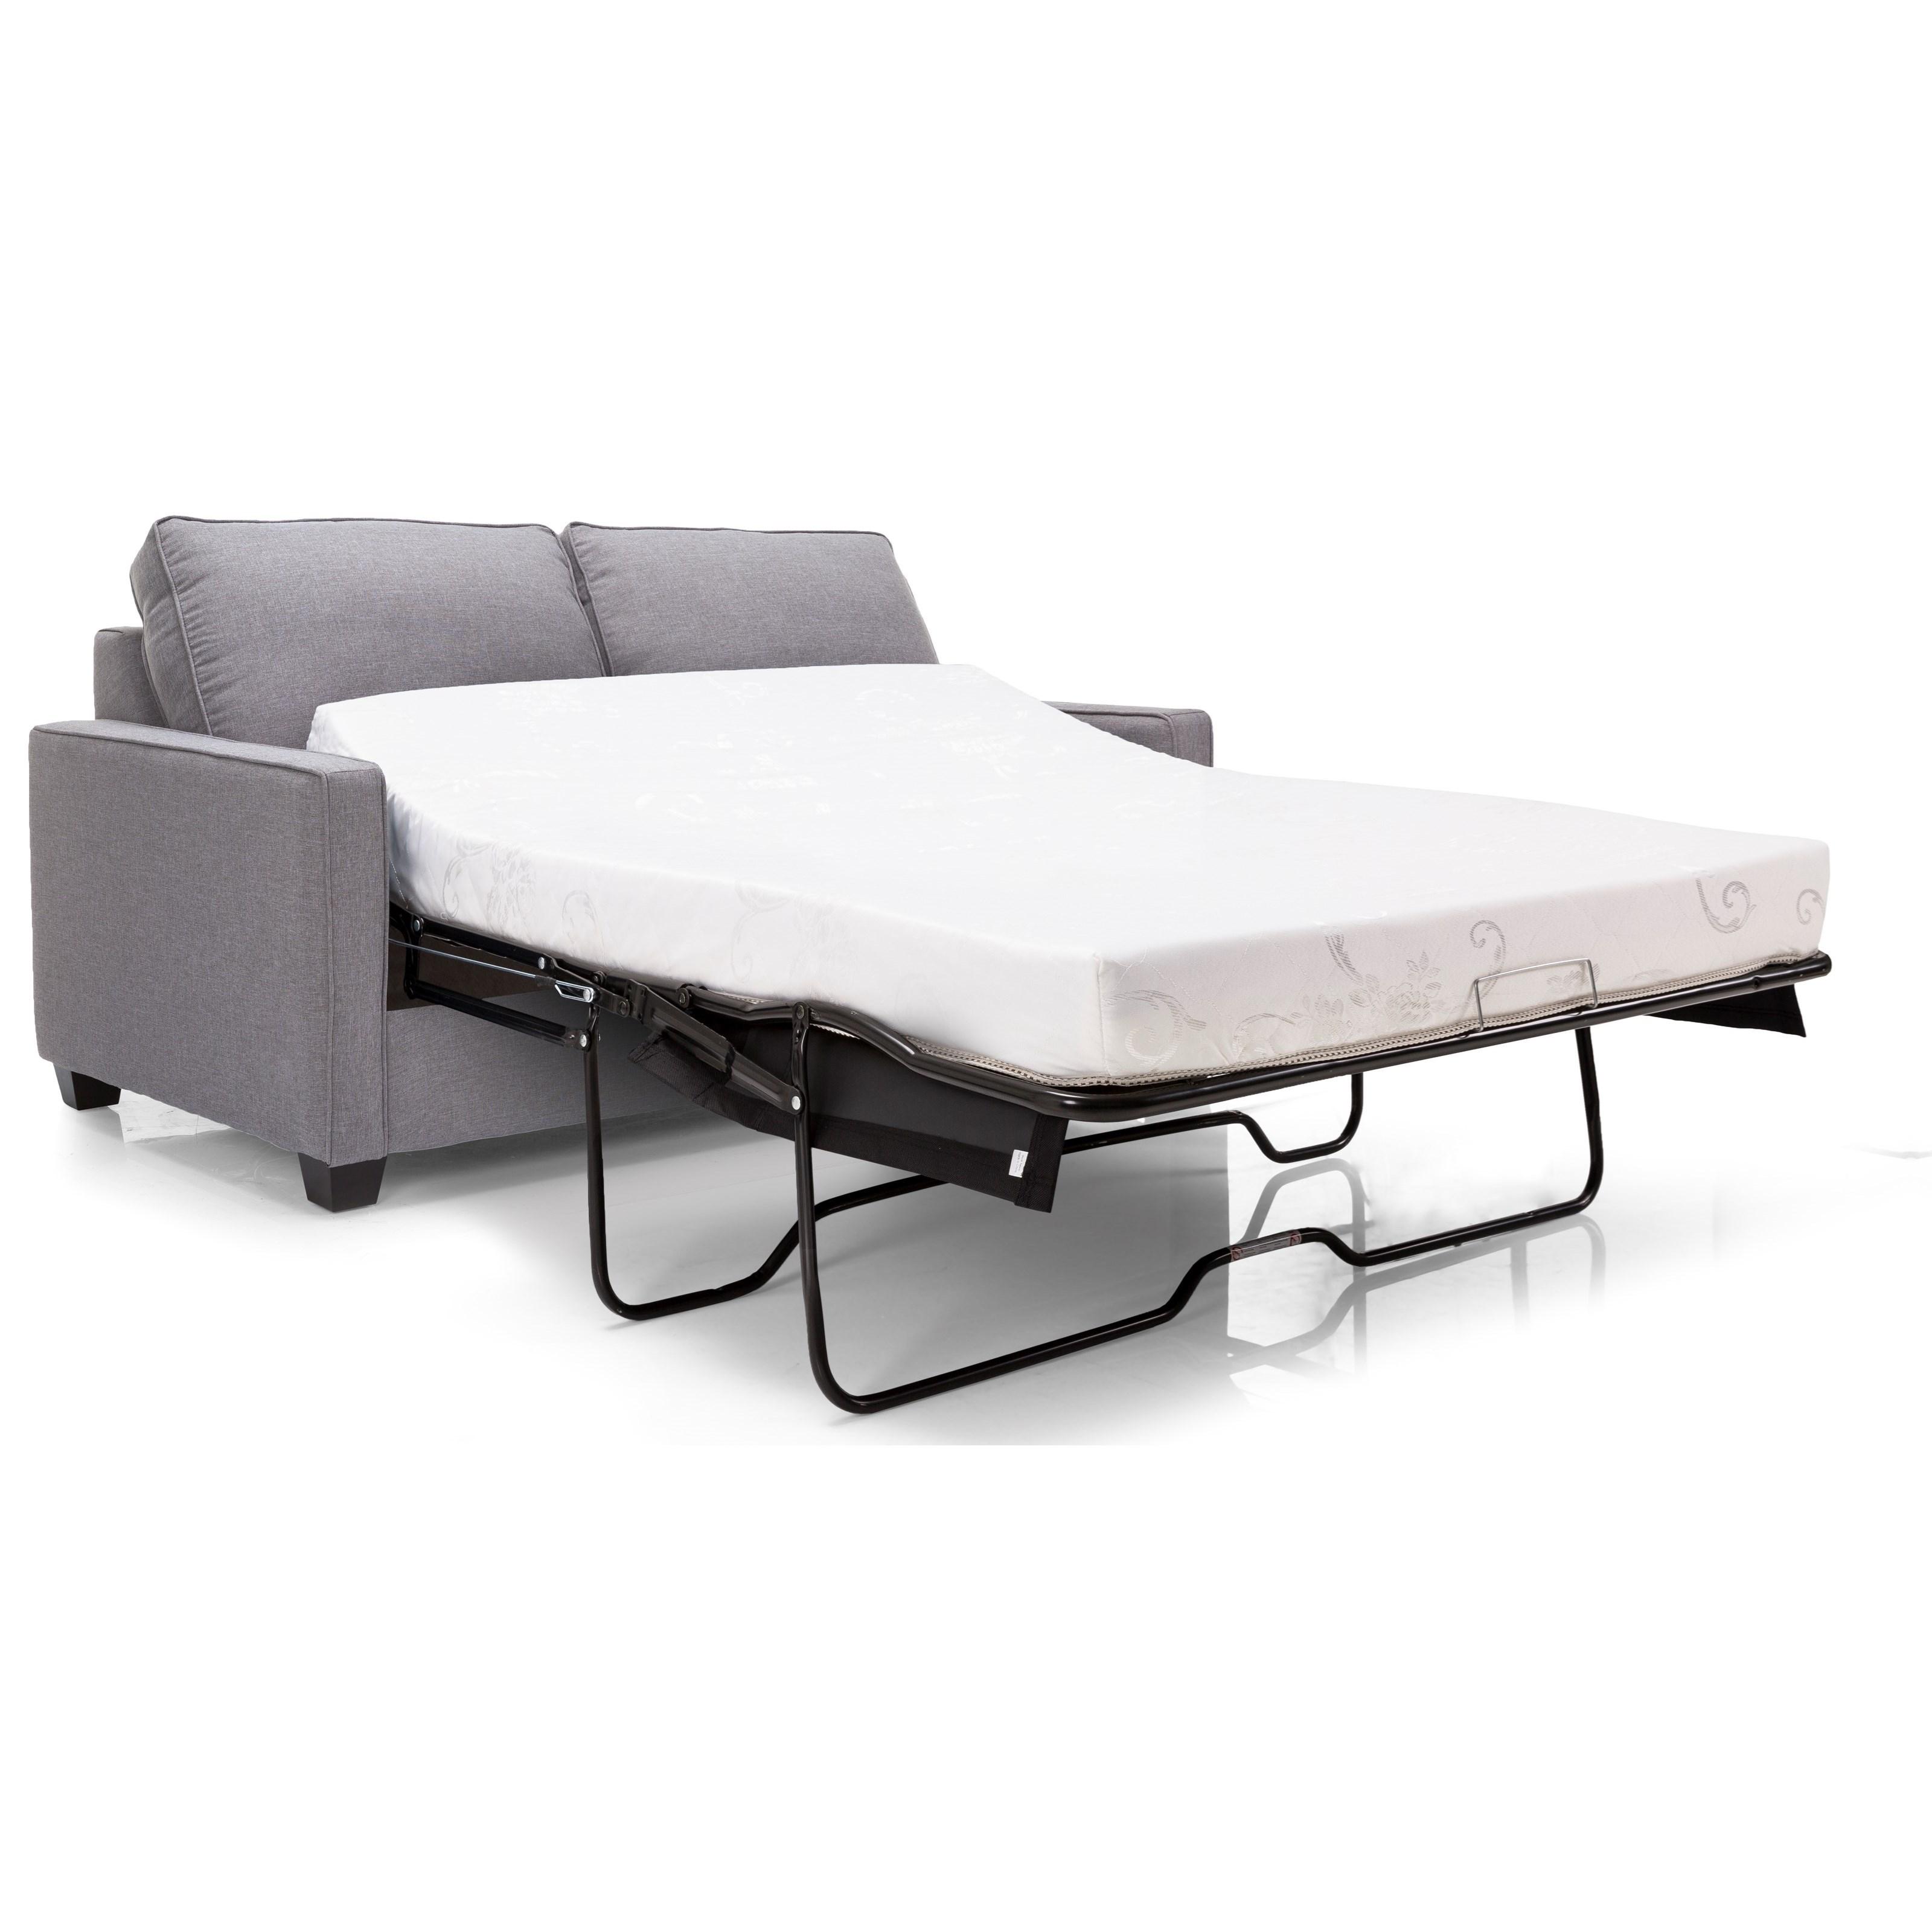 ... Decor Rest 2855Double Sleeper Sofa Bed